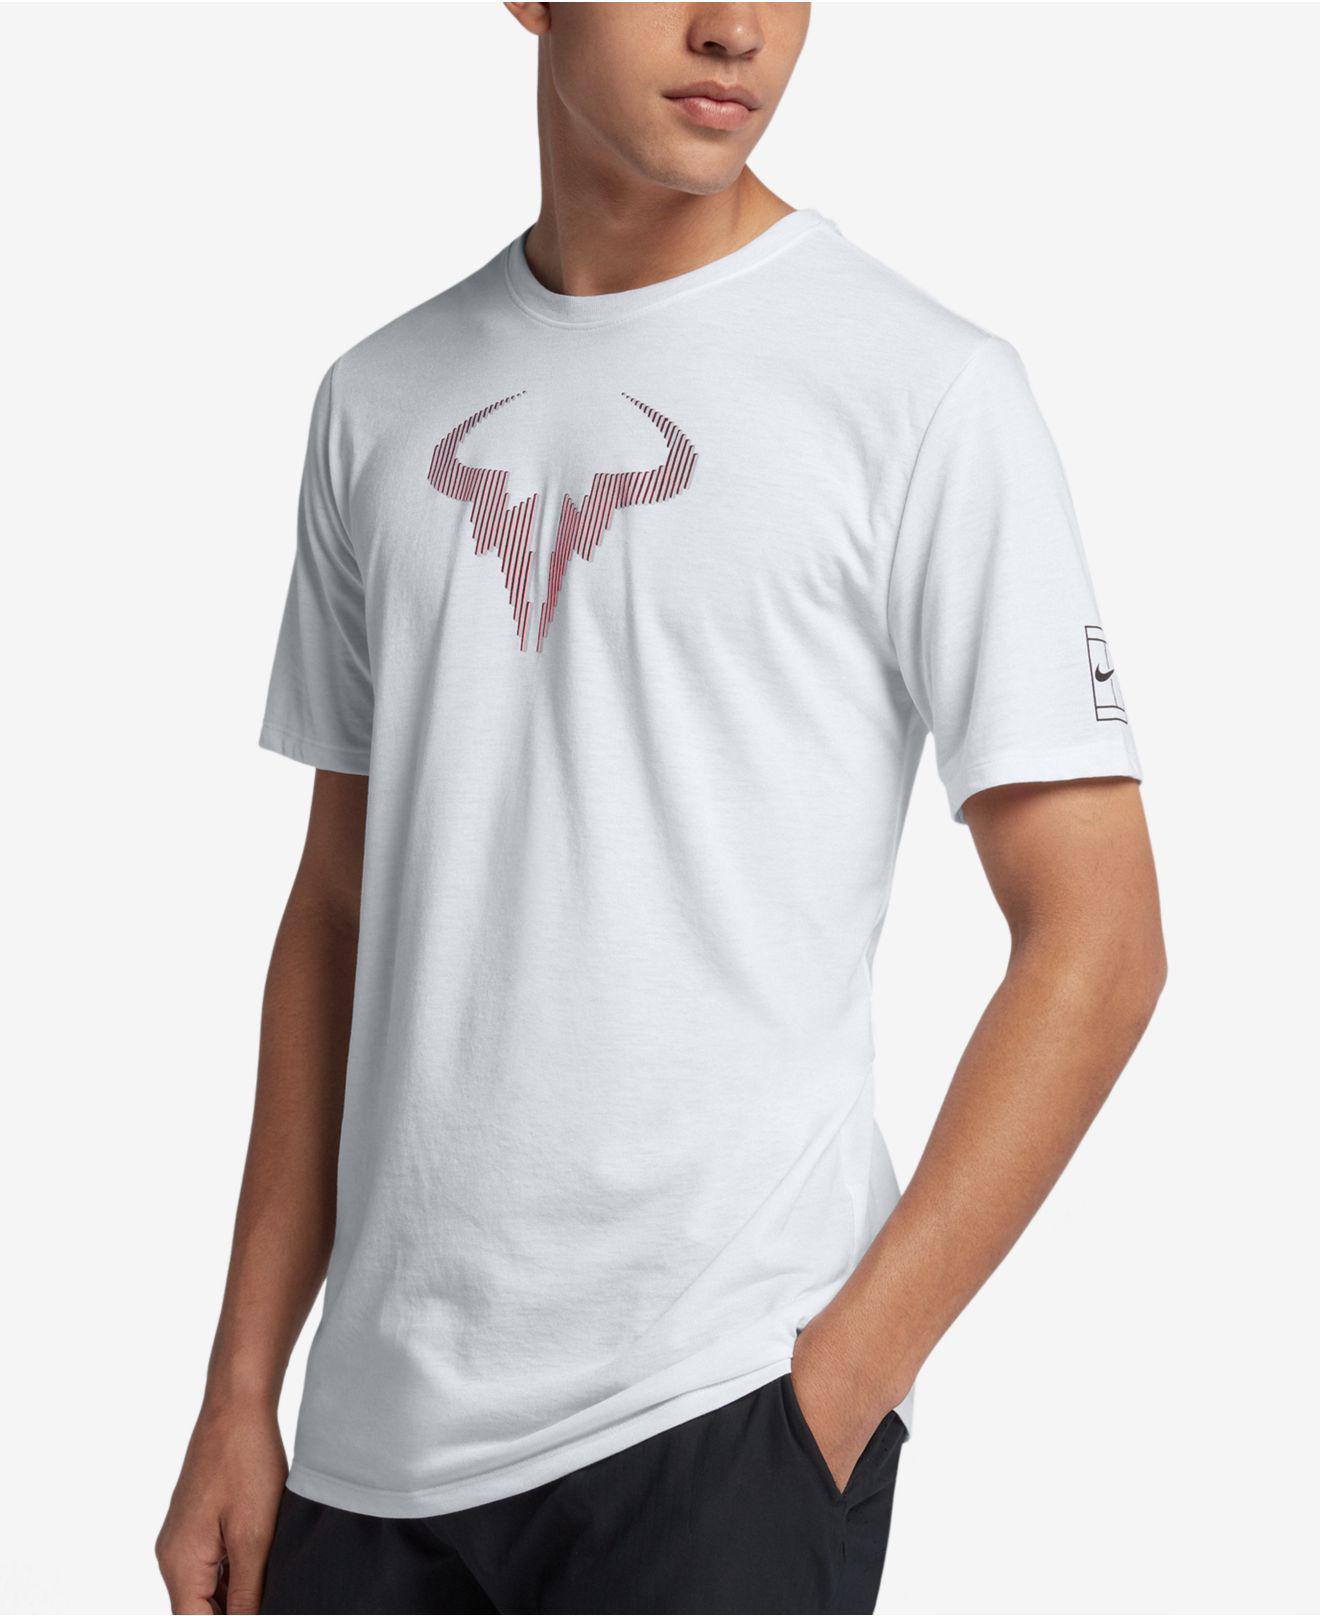 T In Lyst Shirt Rafa White Court For Nike Tennis Dry Men qwx4Xq0r